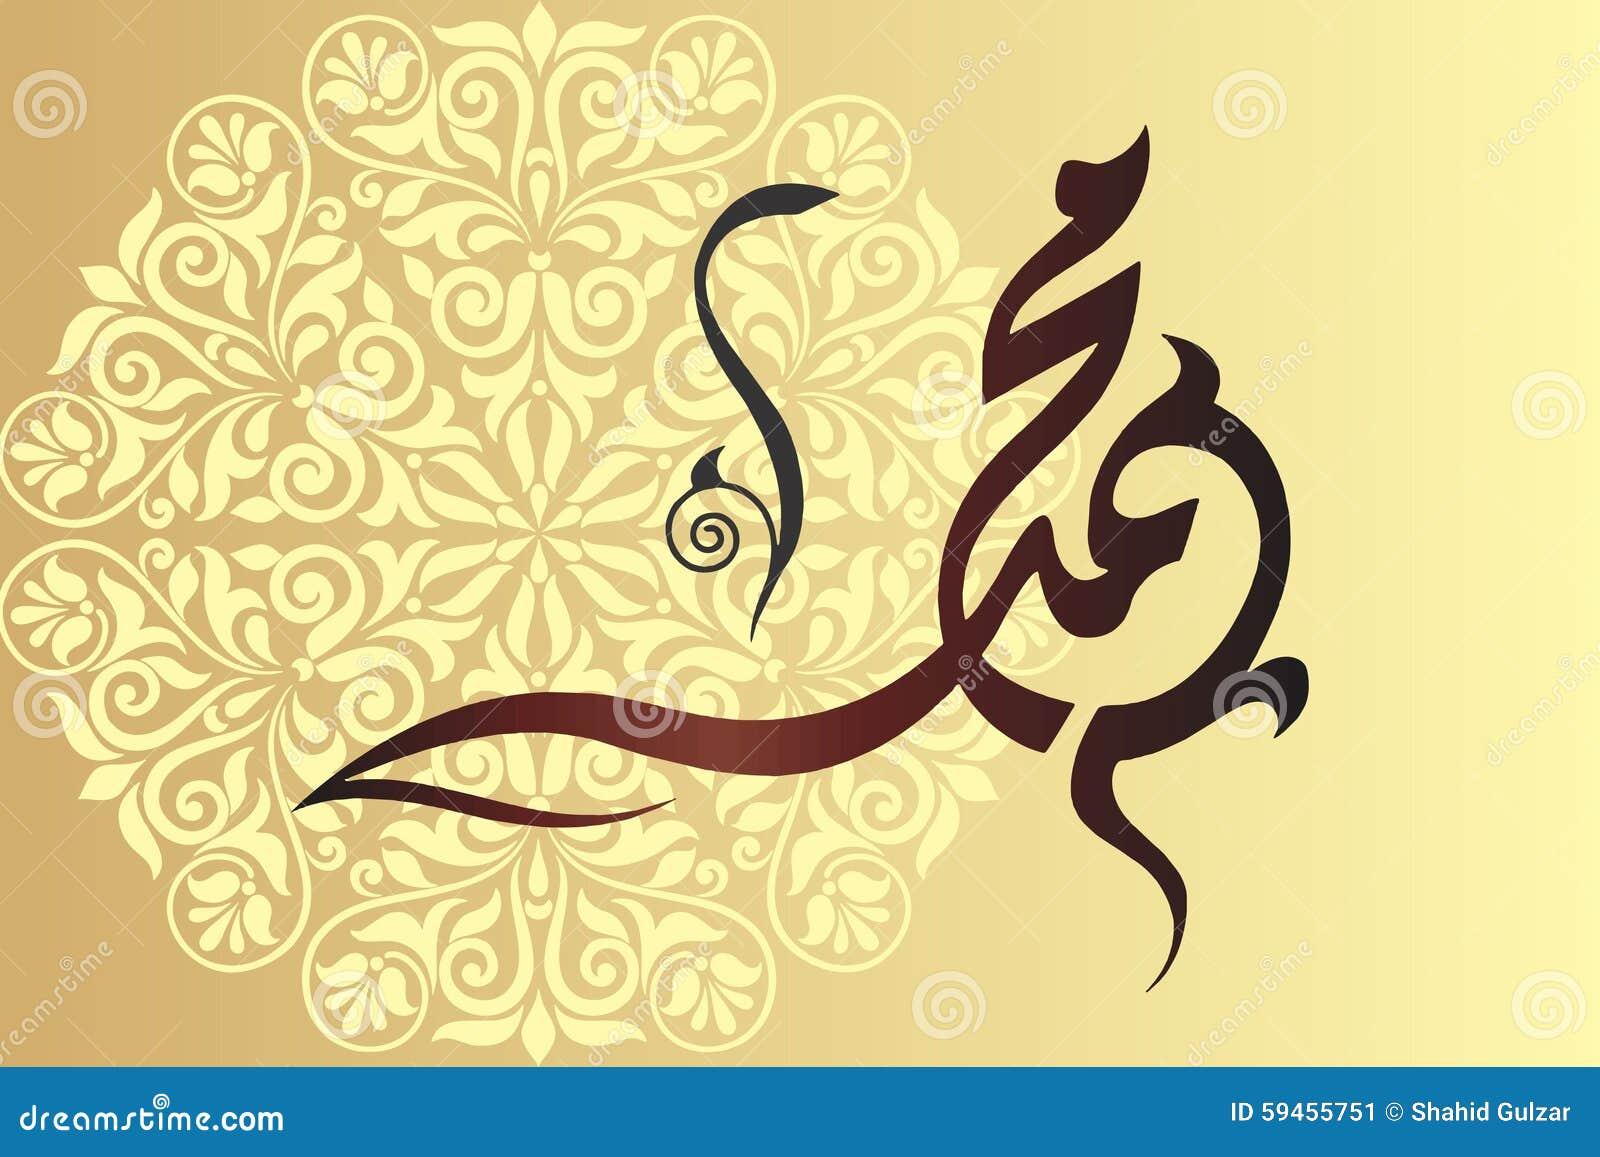 Islamic Calligraphy Ornamental Background Muhammad Stock ...